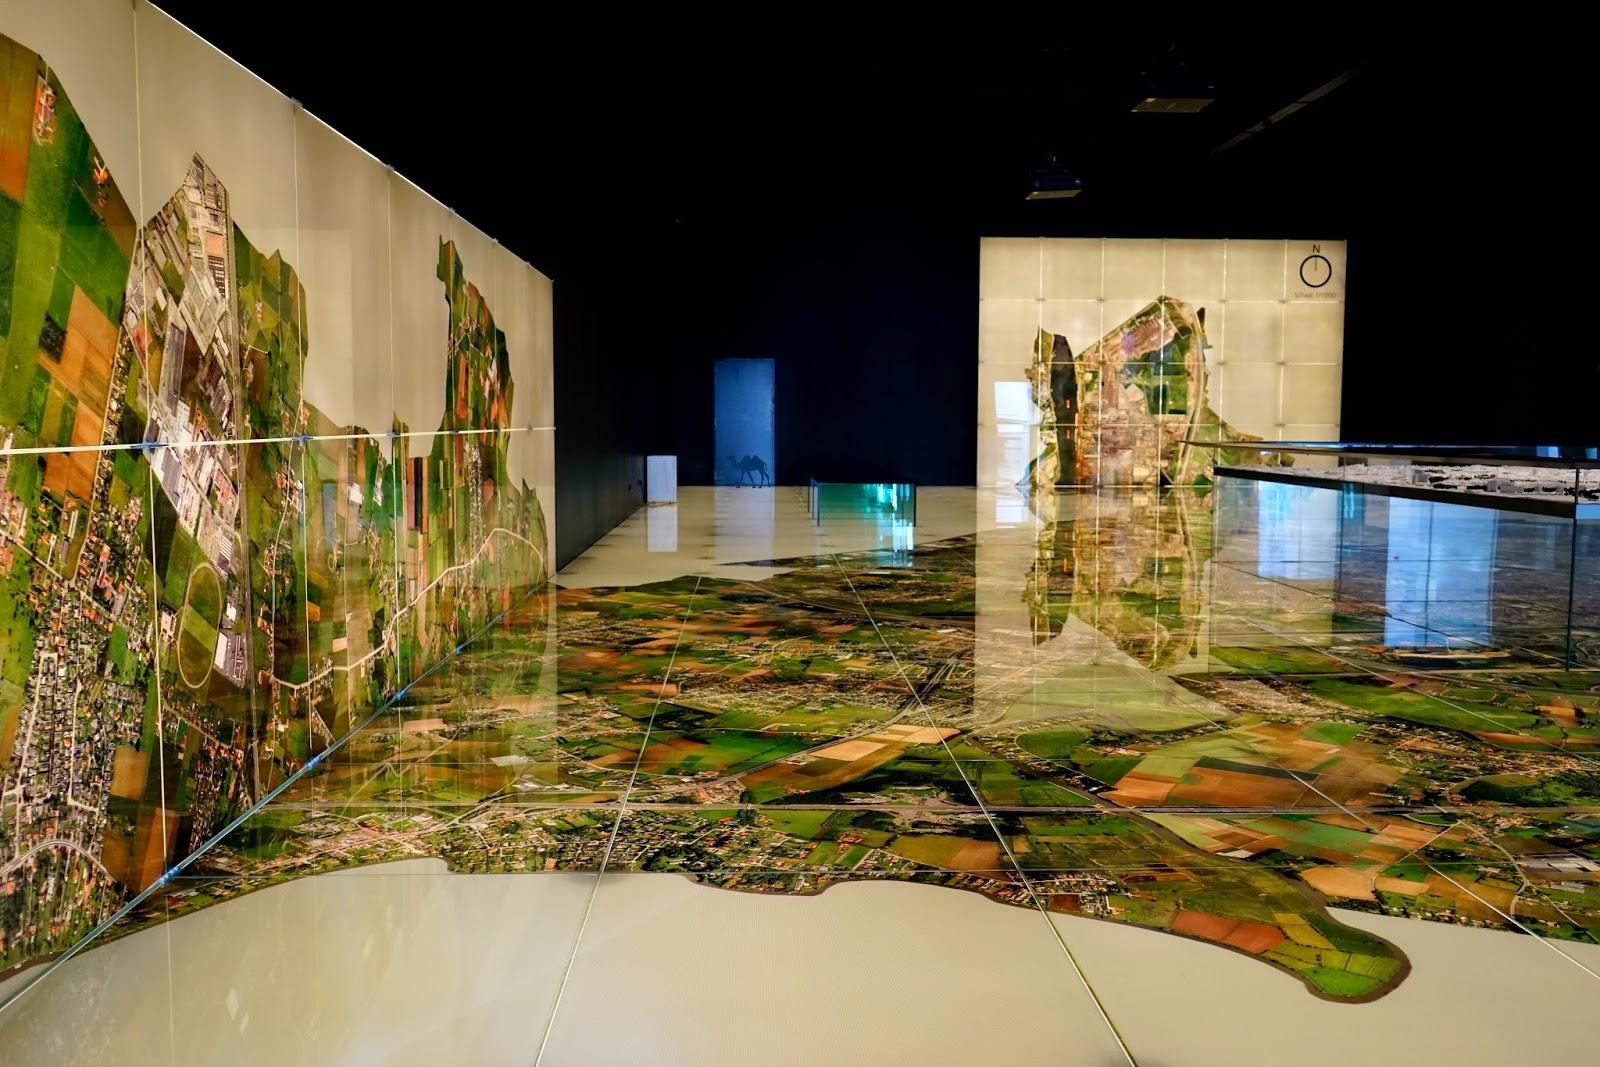 Le Chameau Bleu - Blog Voyage Gand Belgique - Gand Tourisme - Salle du musée STAM Gand Belgique